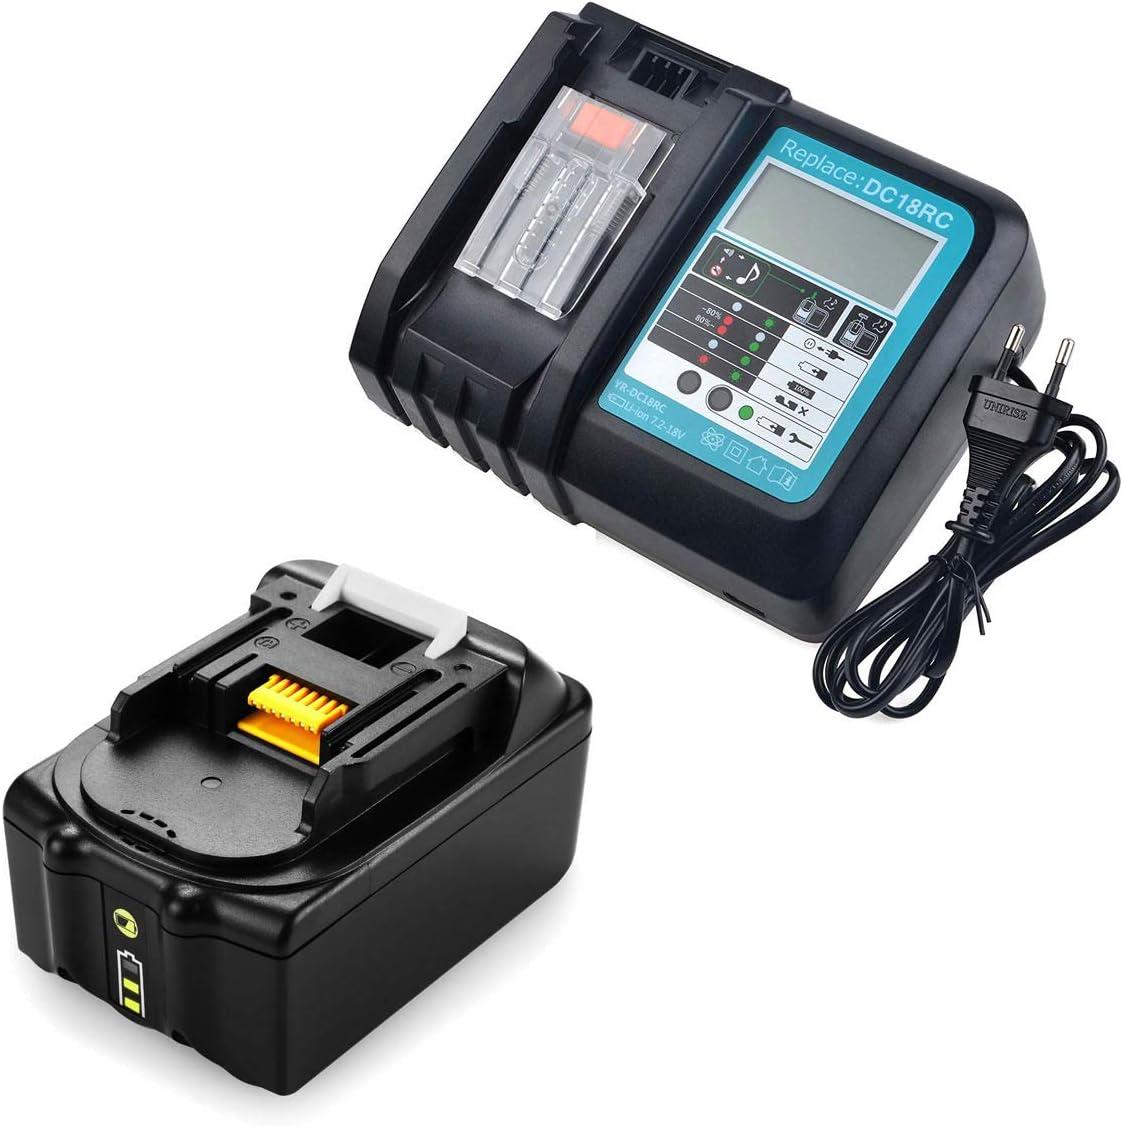 18V 5,0Ah BL1850B Bater/ía con Cargador DC18RC Makita Reemplazo para Makita BL1850 BL1850B BL1860B BL1840 BL1830 BL1815 194204-5